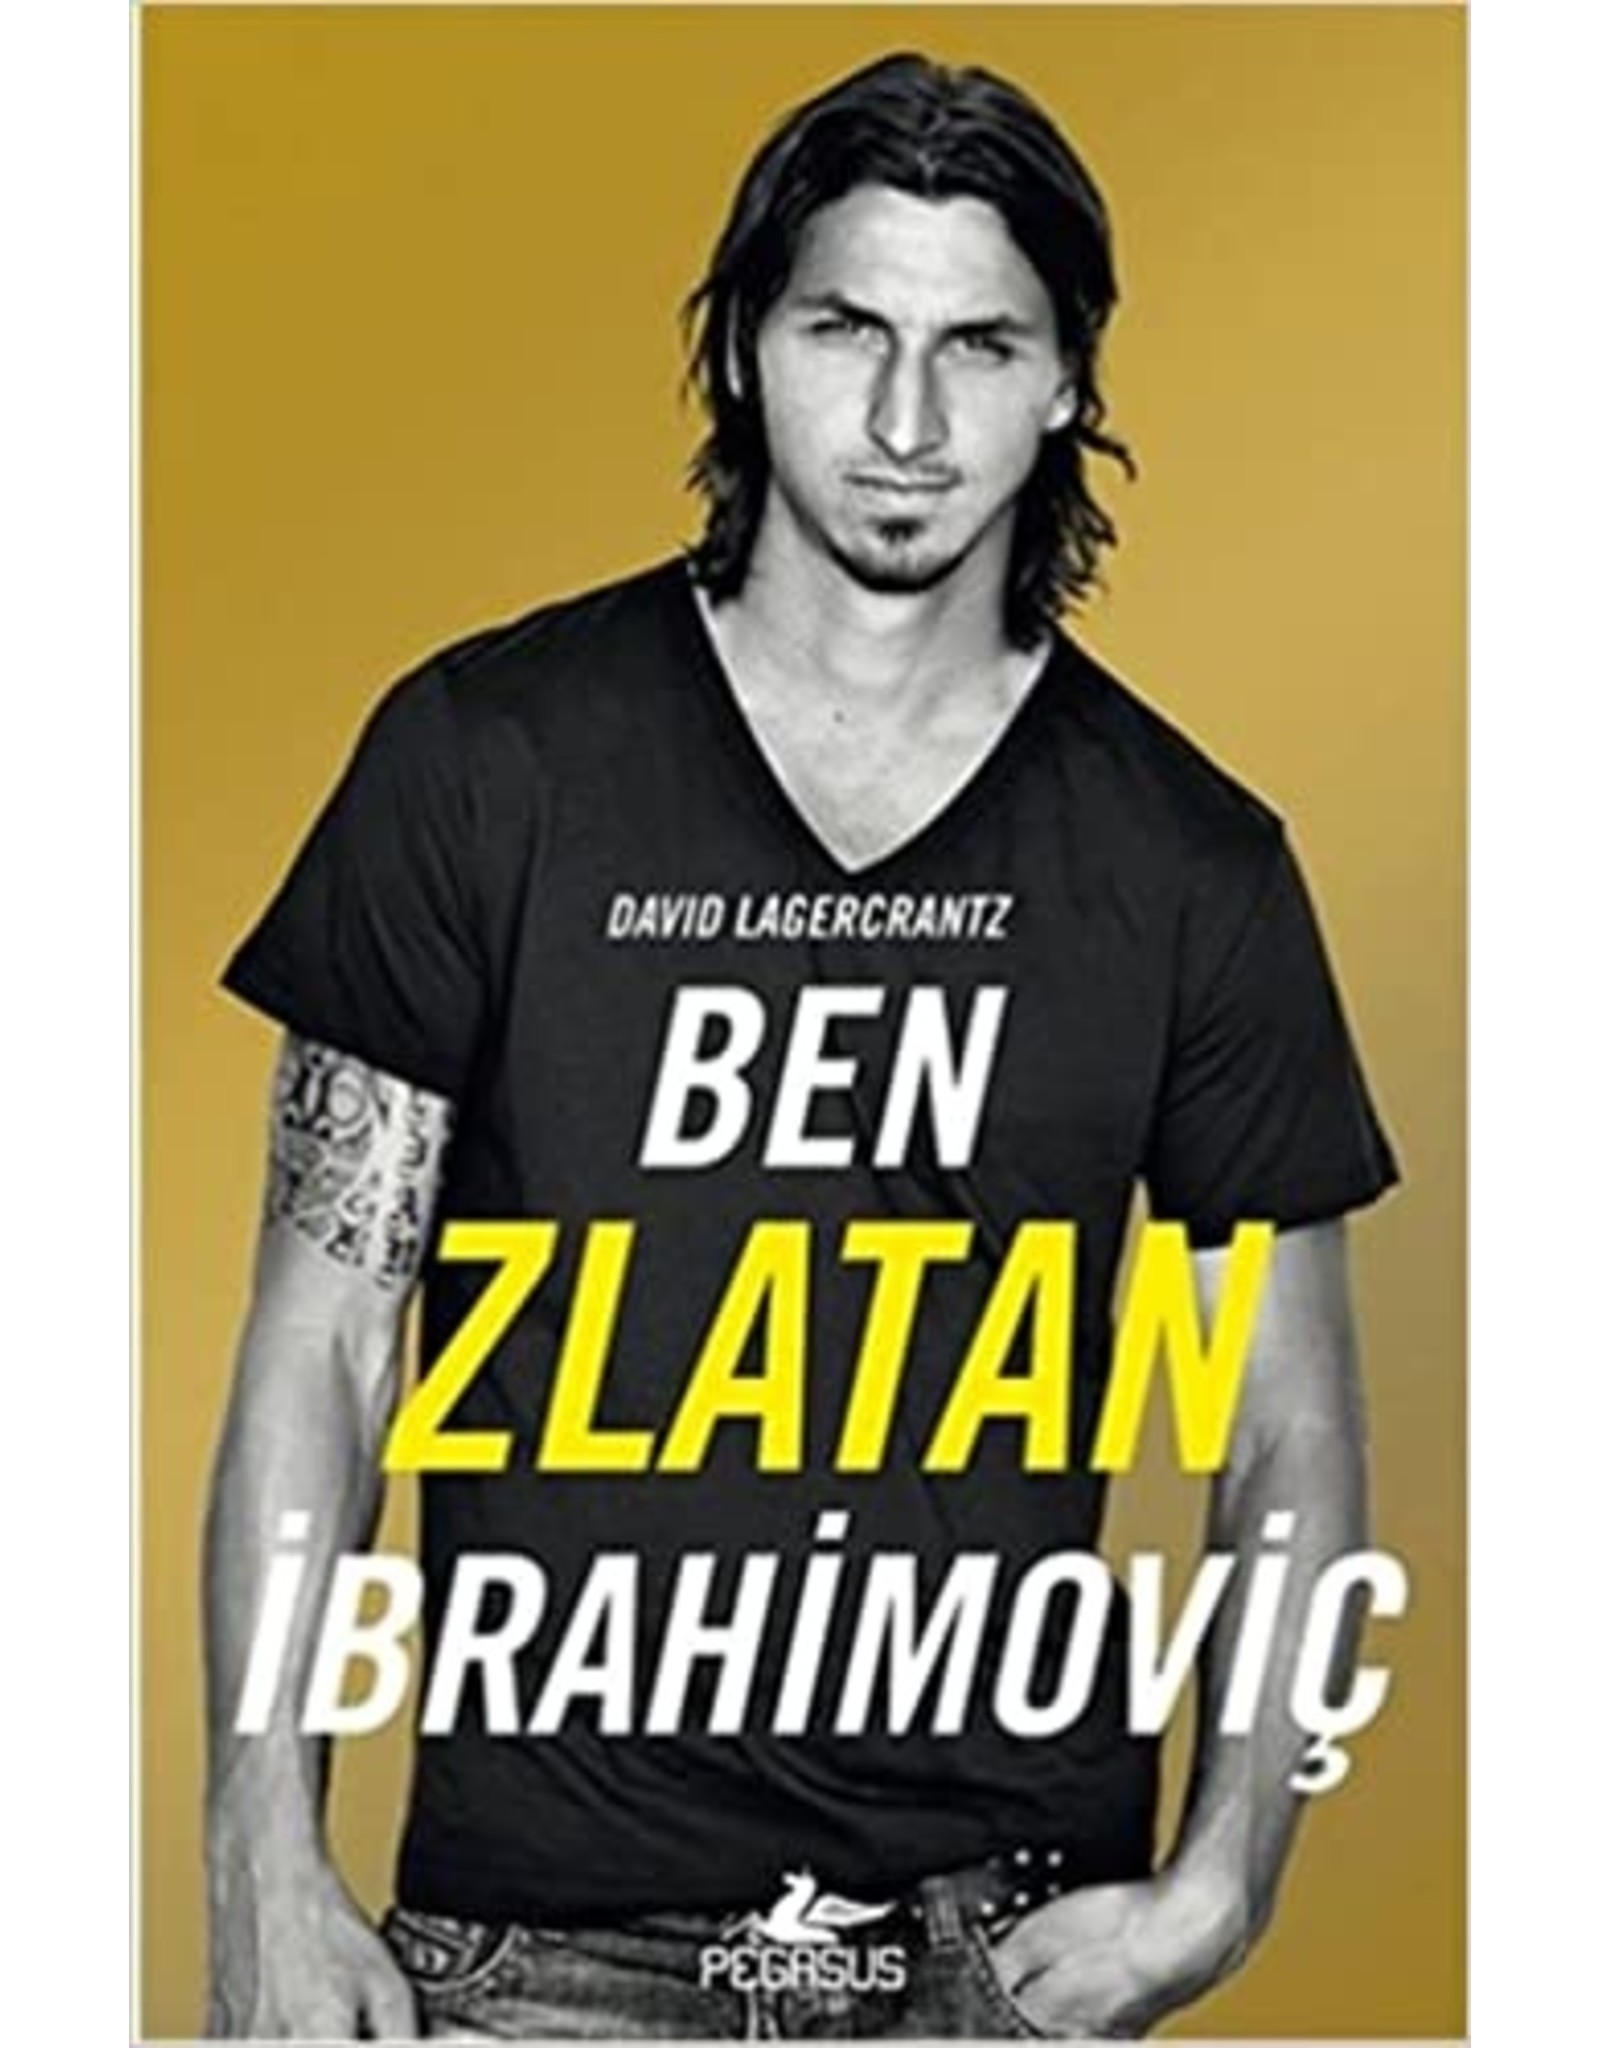 David Lagercrantz Ben Zlatan İbrahimoviç